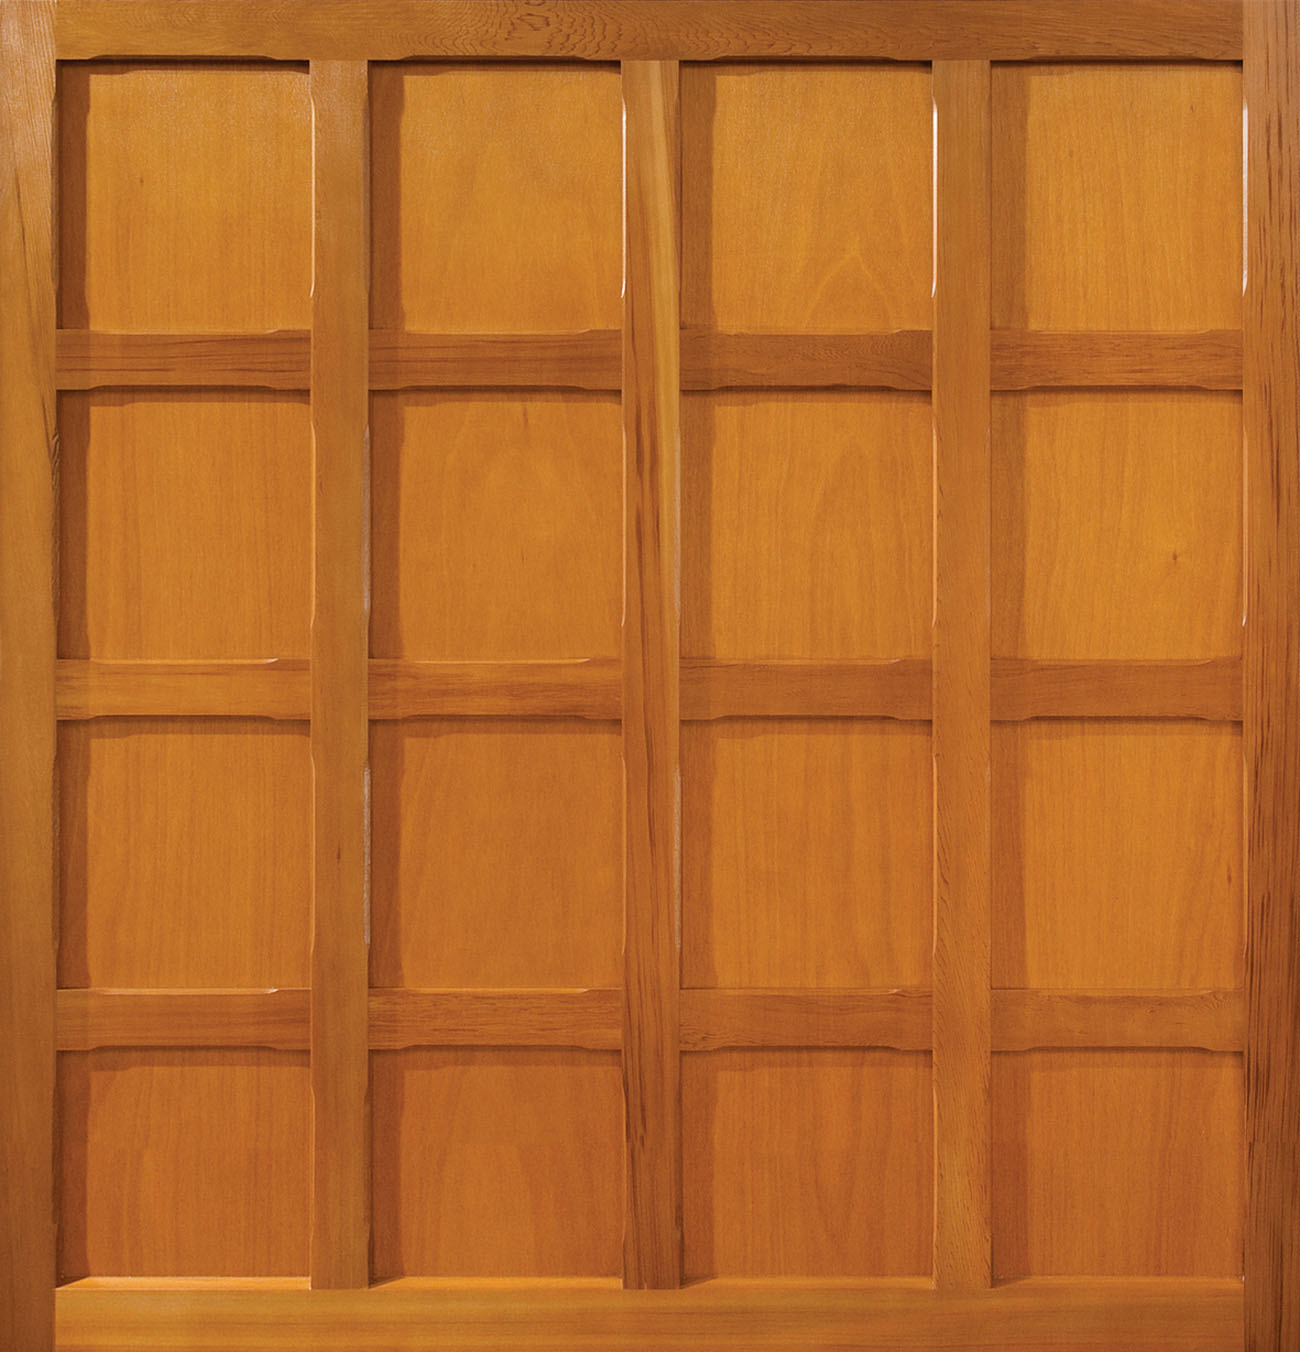 Appley panel-built cedar